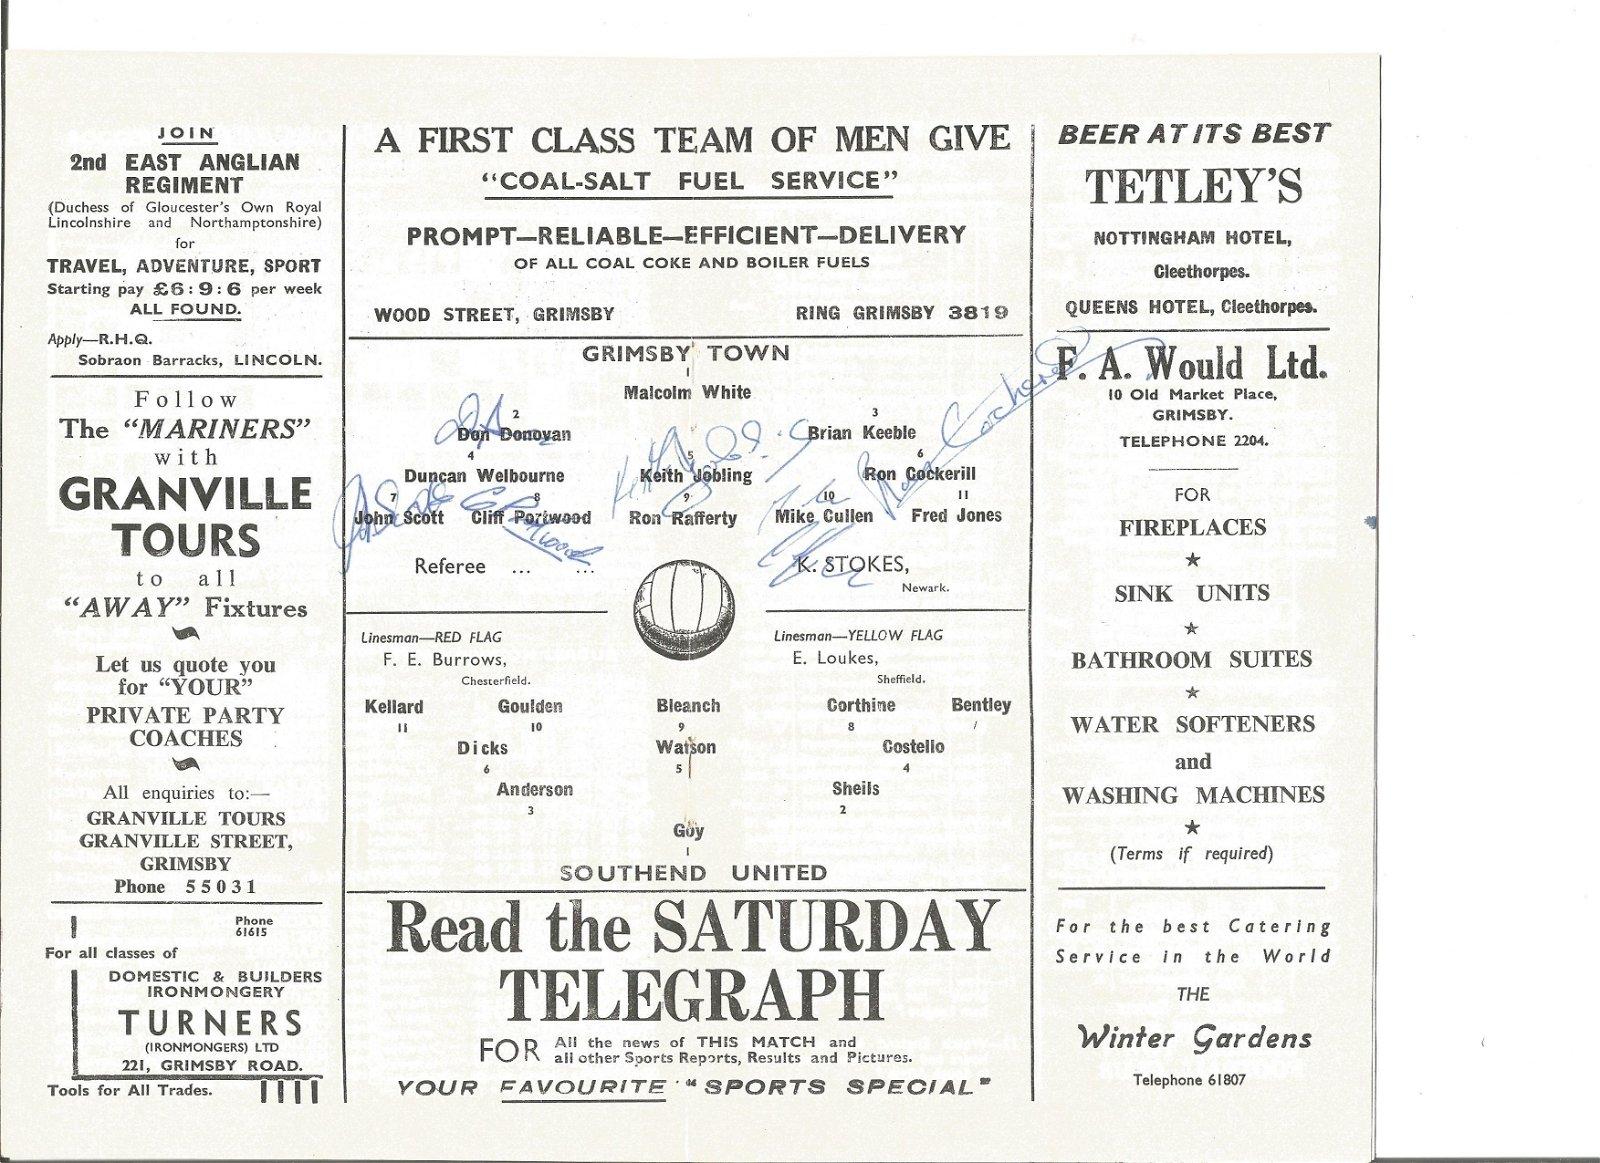 1961 Grimsby Town v Southend Utd programme. Signed by 6